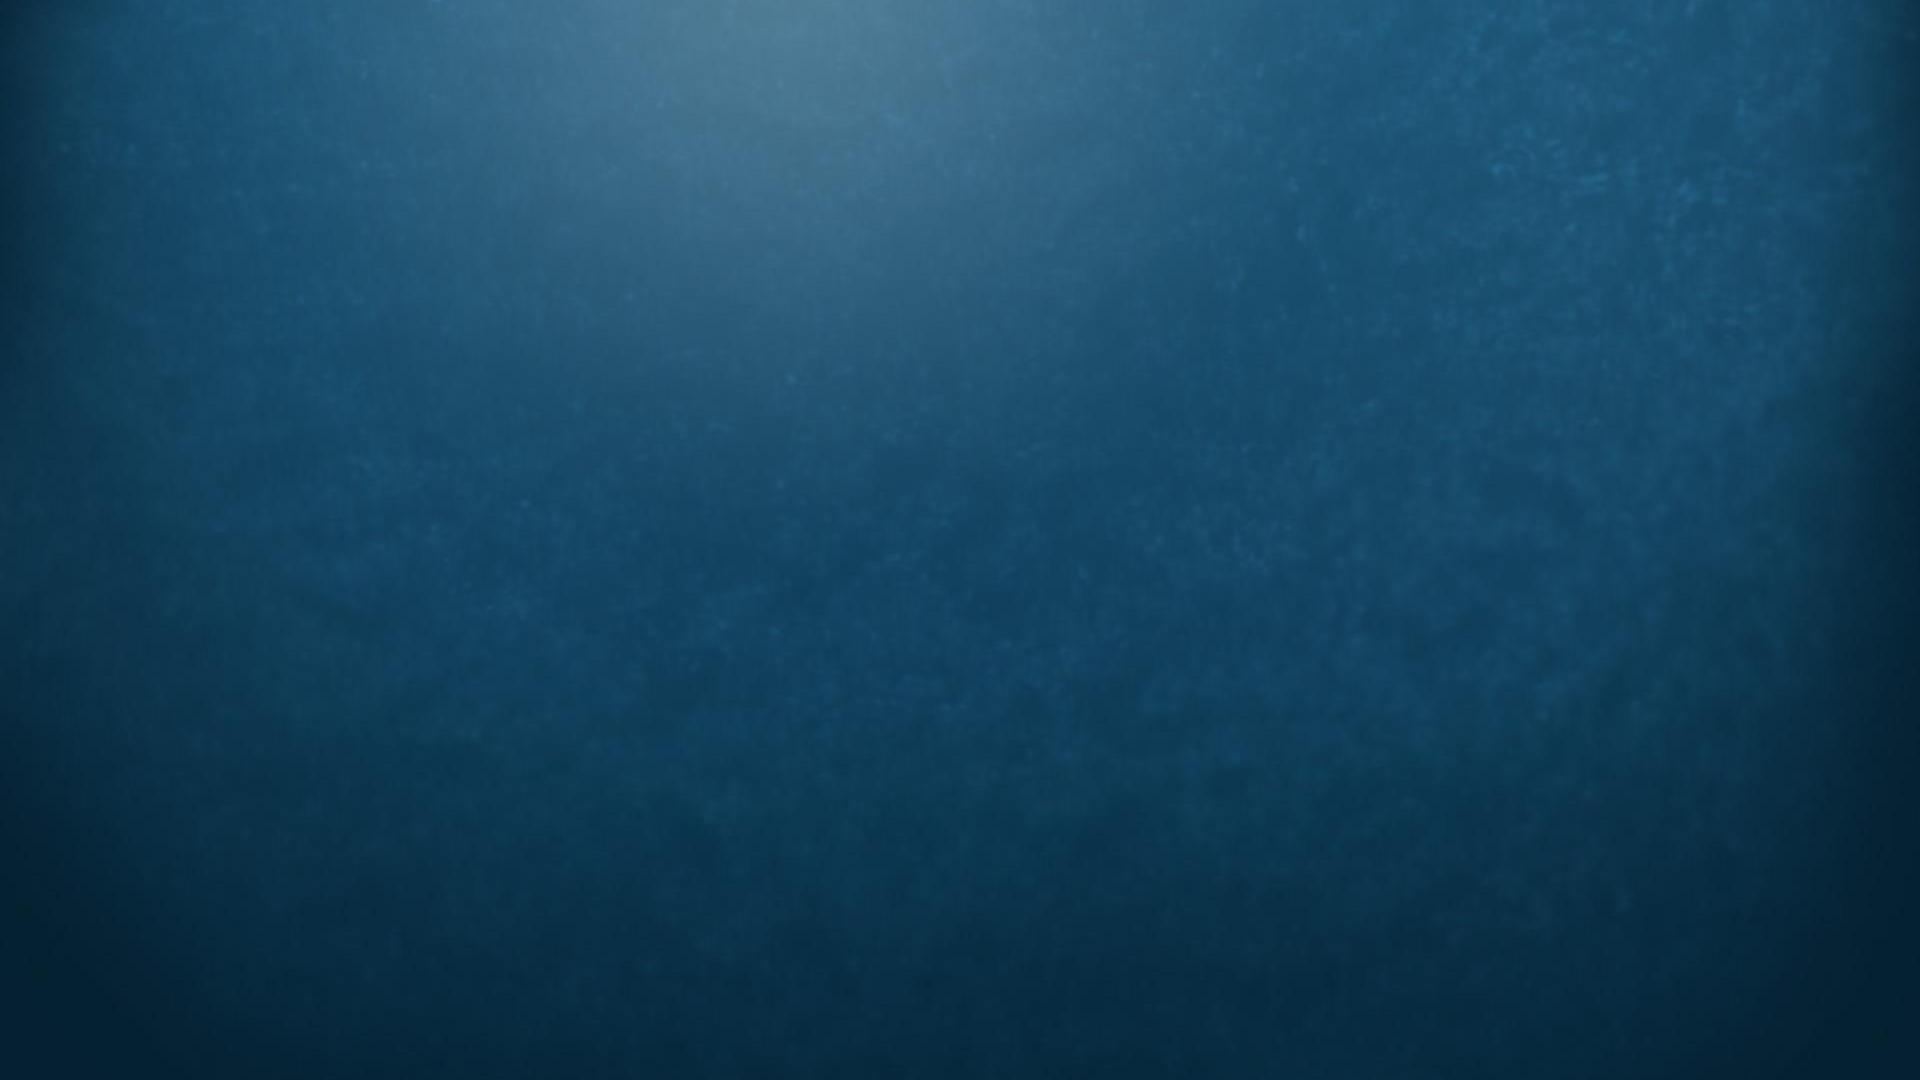   Abstract Blue Gradient Desktop Wallpaper   Blue Wallpapers